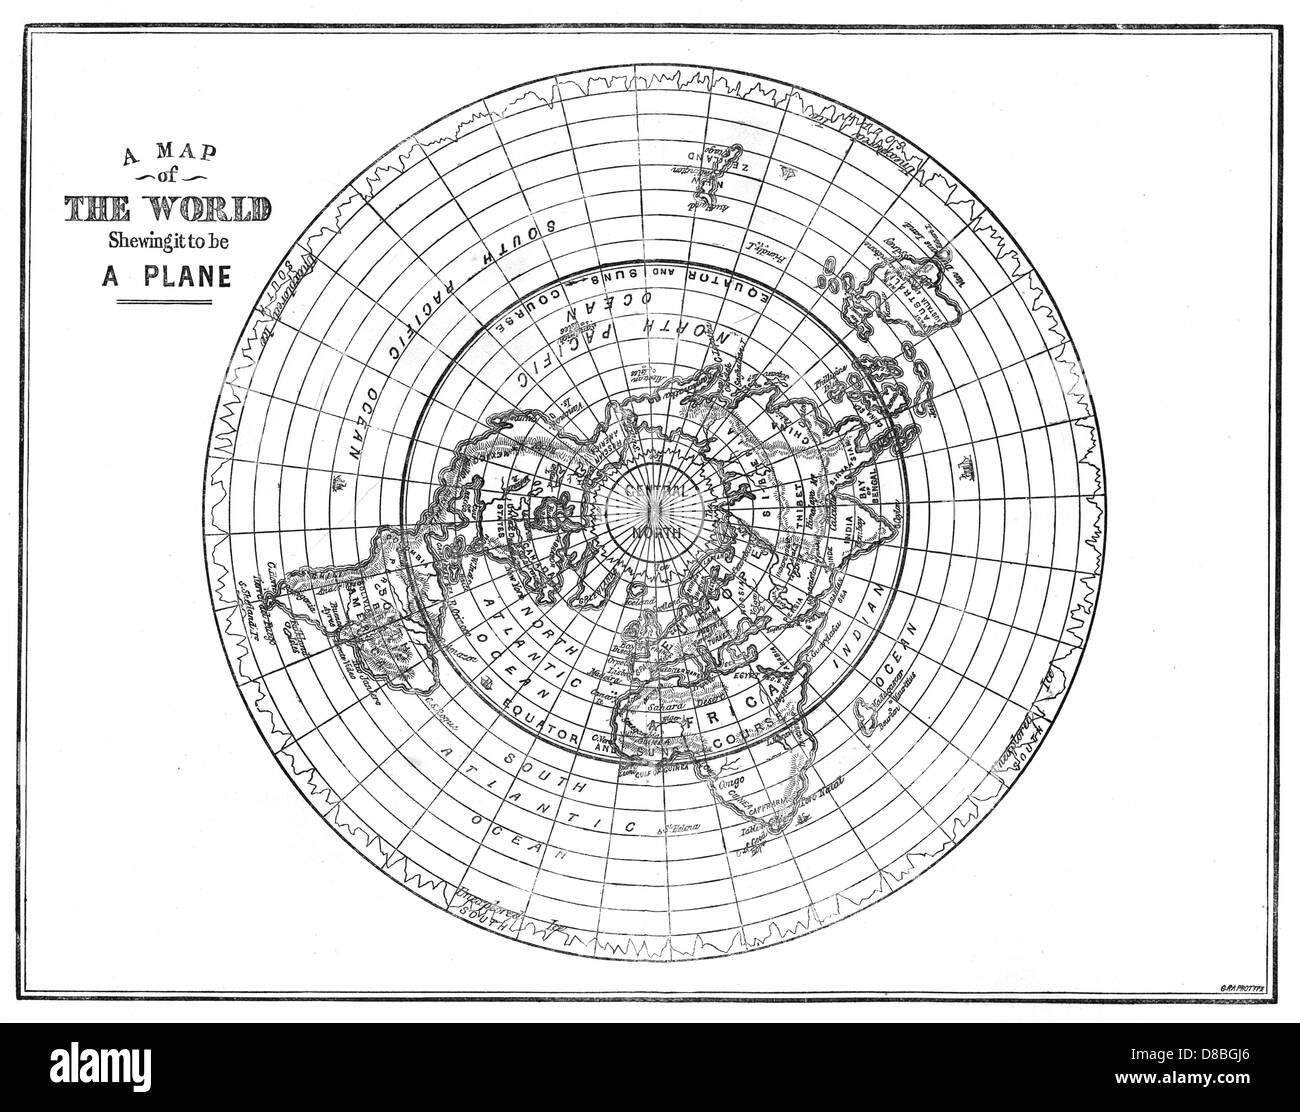 Flache Erde Karte Kaufen.Flache Erde Stockfoto Bild 56802878 Alamy